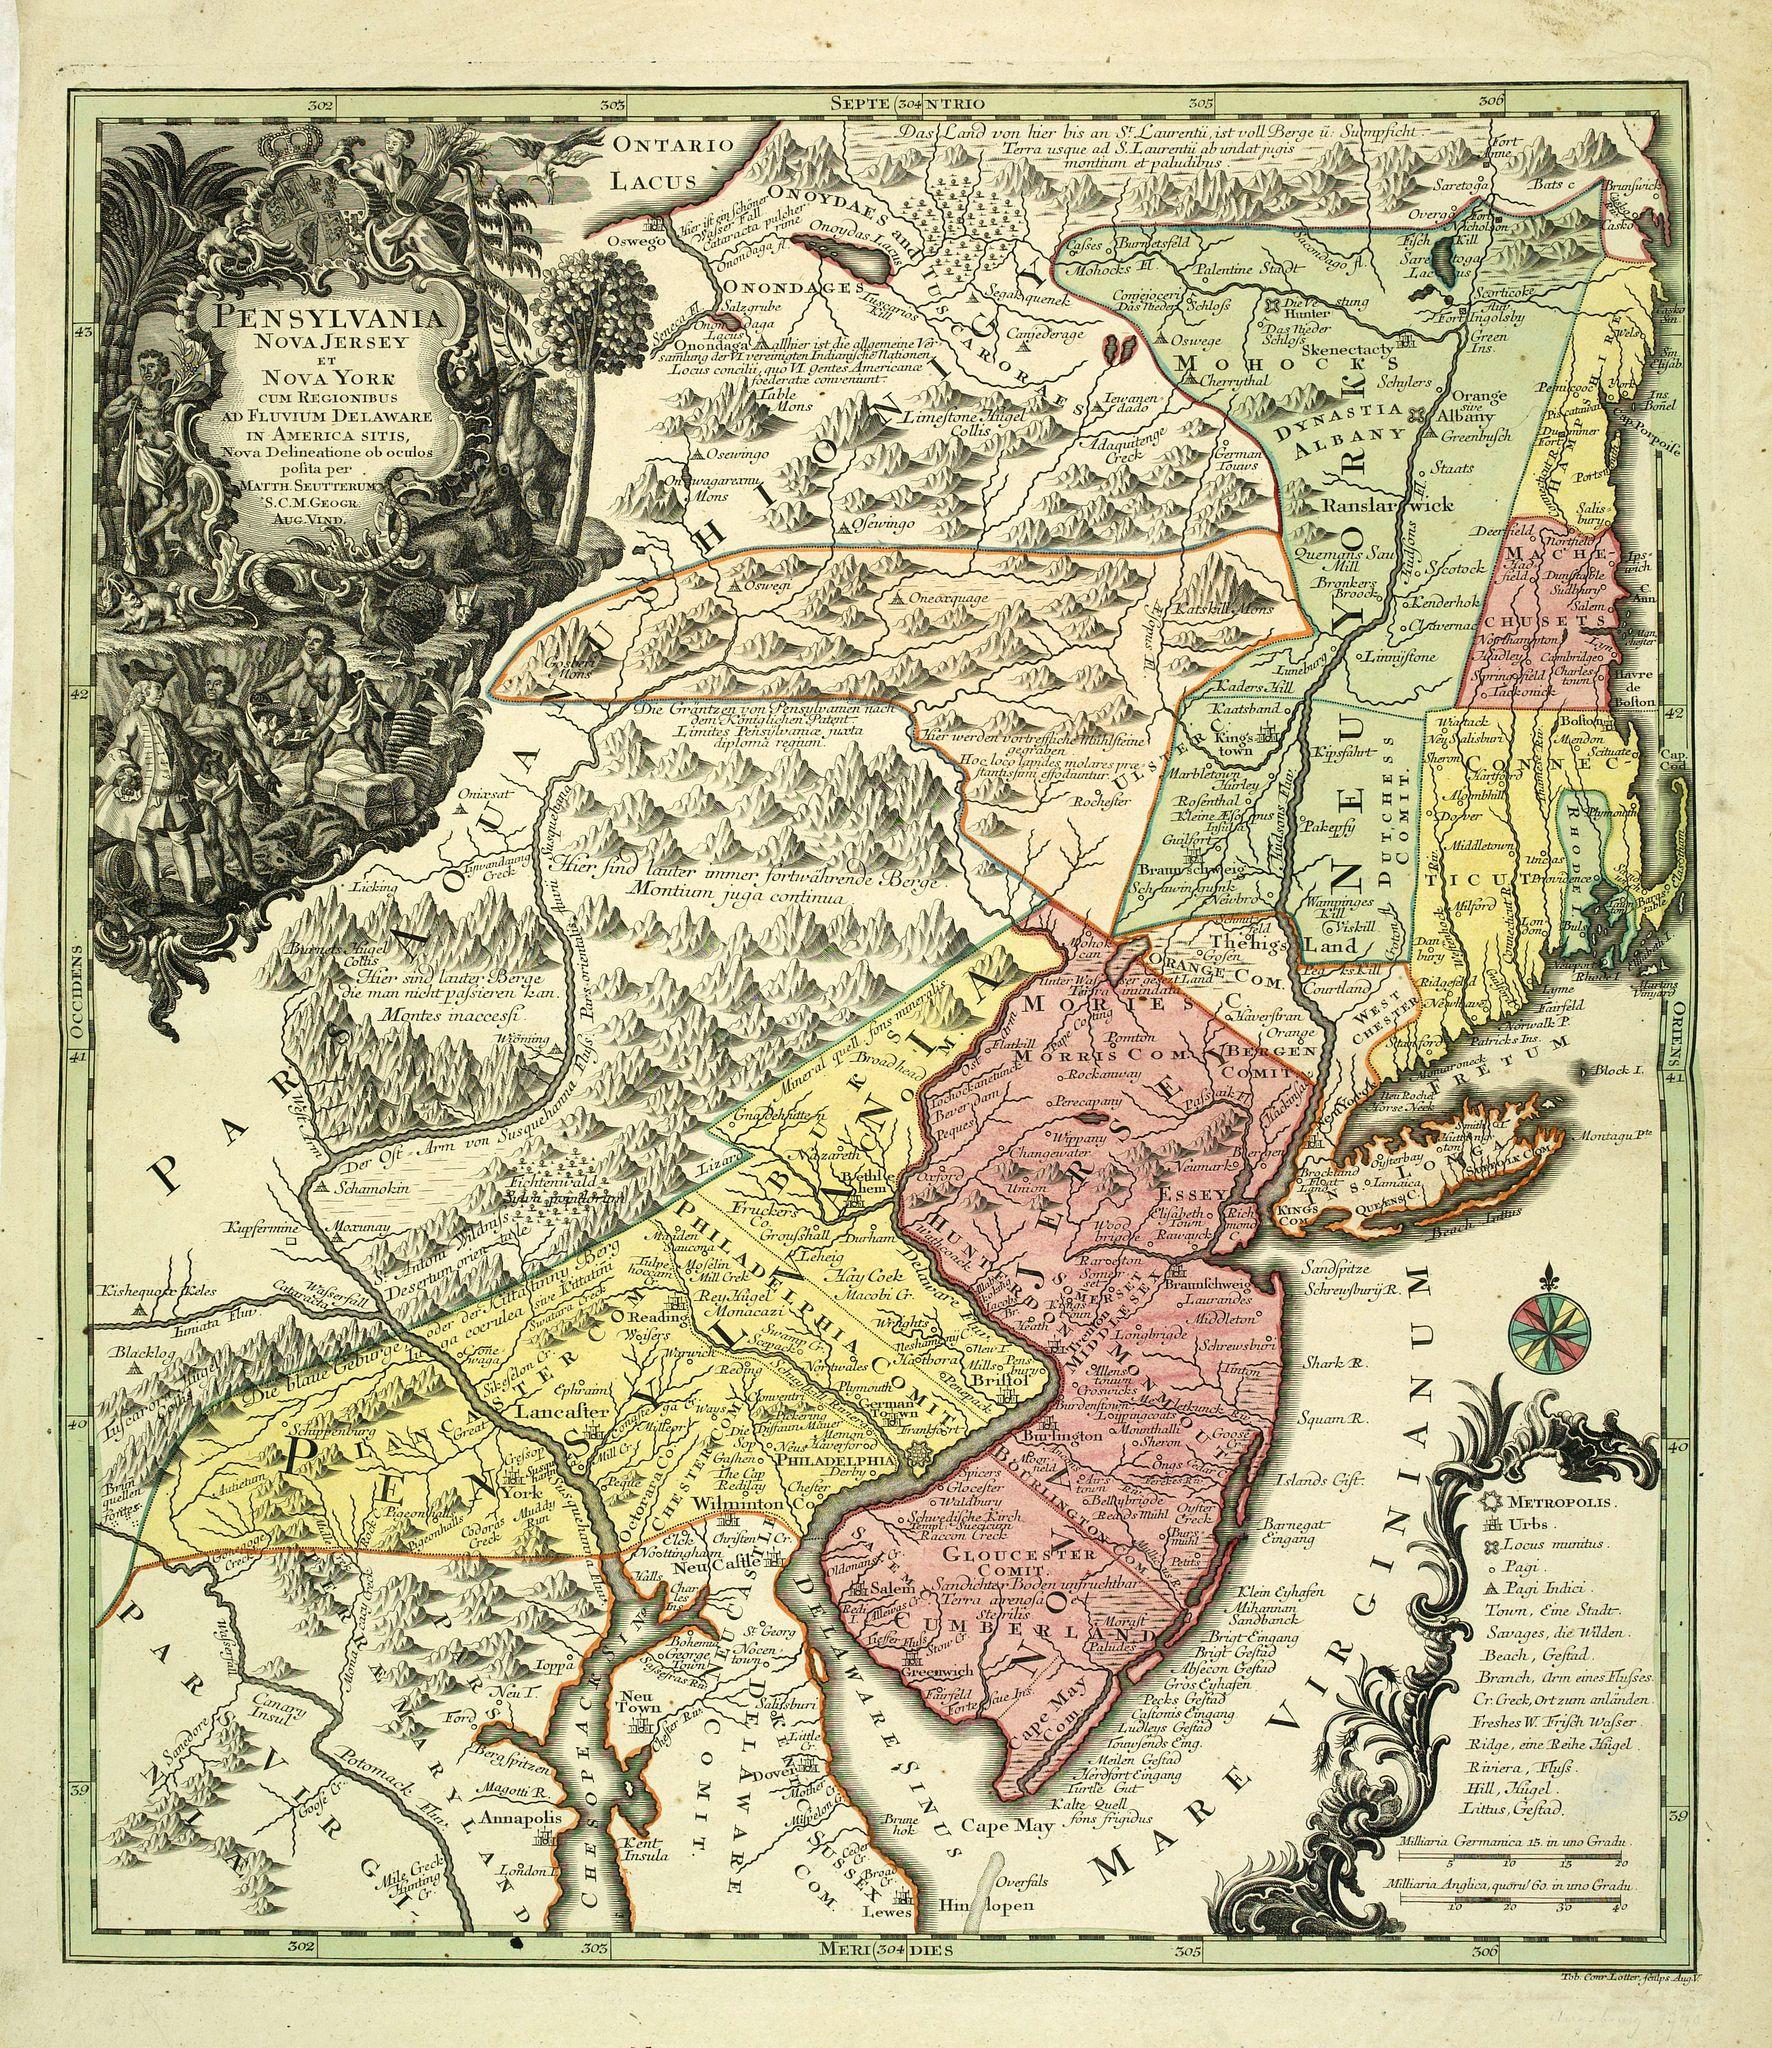 SEUTTER, M. -  Pensylvania, Nova Jersey et Nova York..